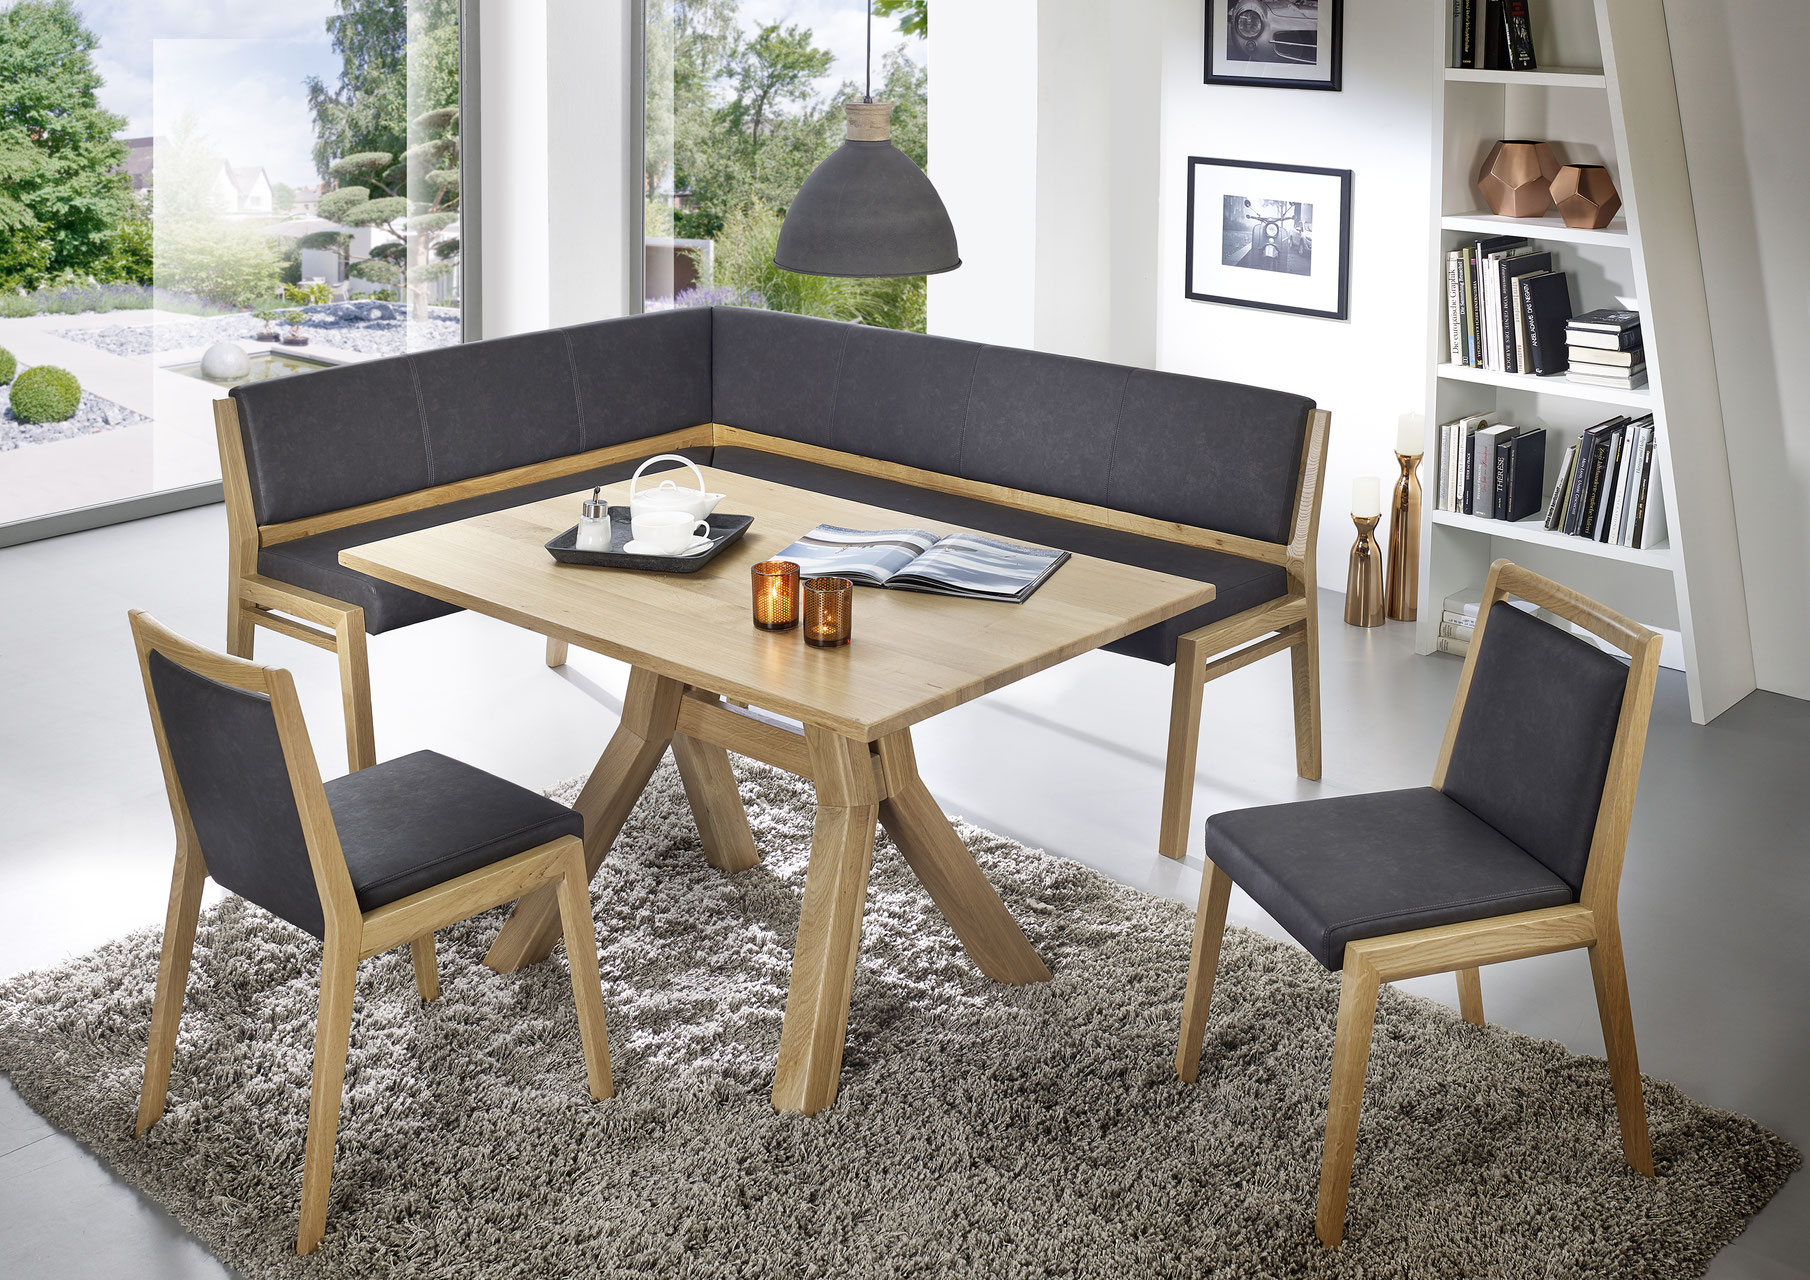 Eckbank Maßanfertigung soul eckbank kunstleder naturnah möbel moderne massivholzmöbel